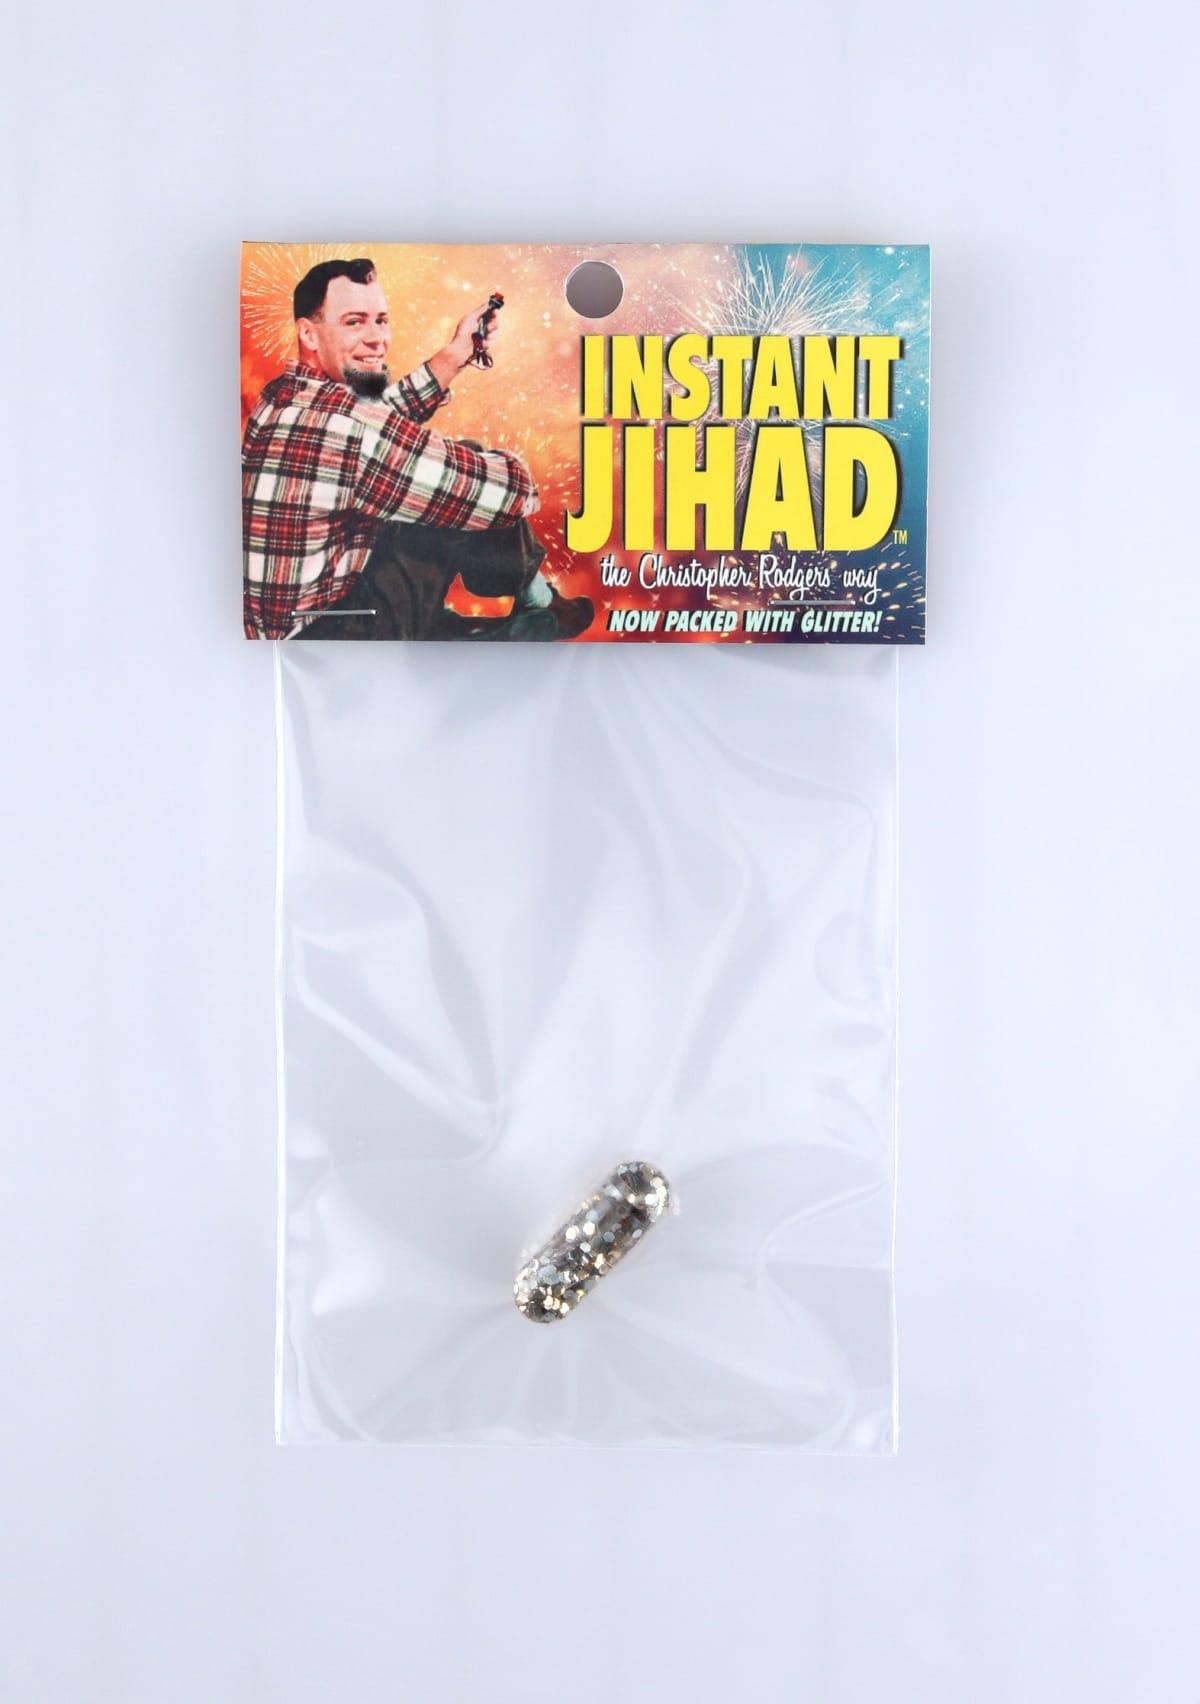 Instant jihad